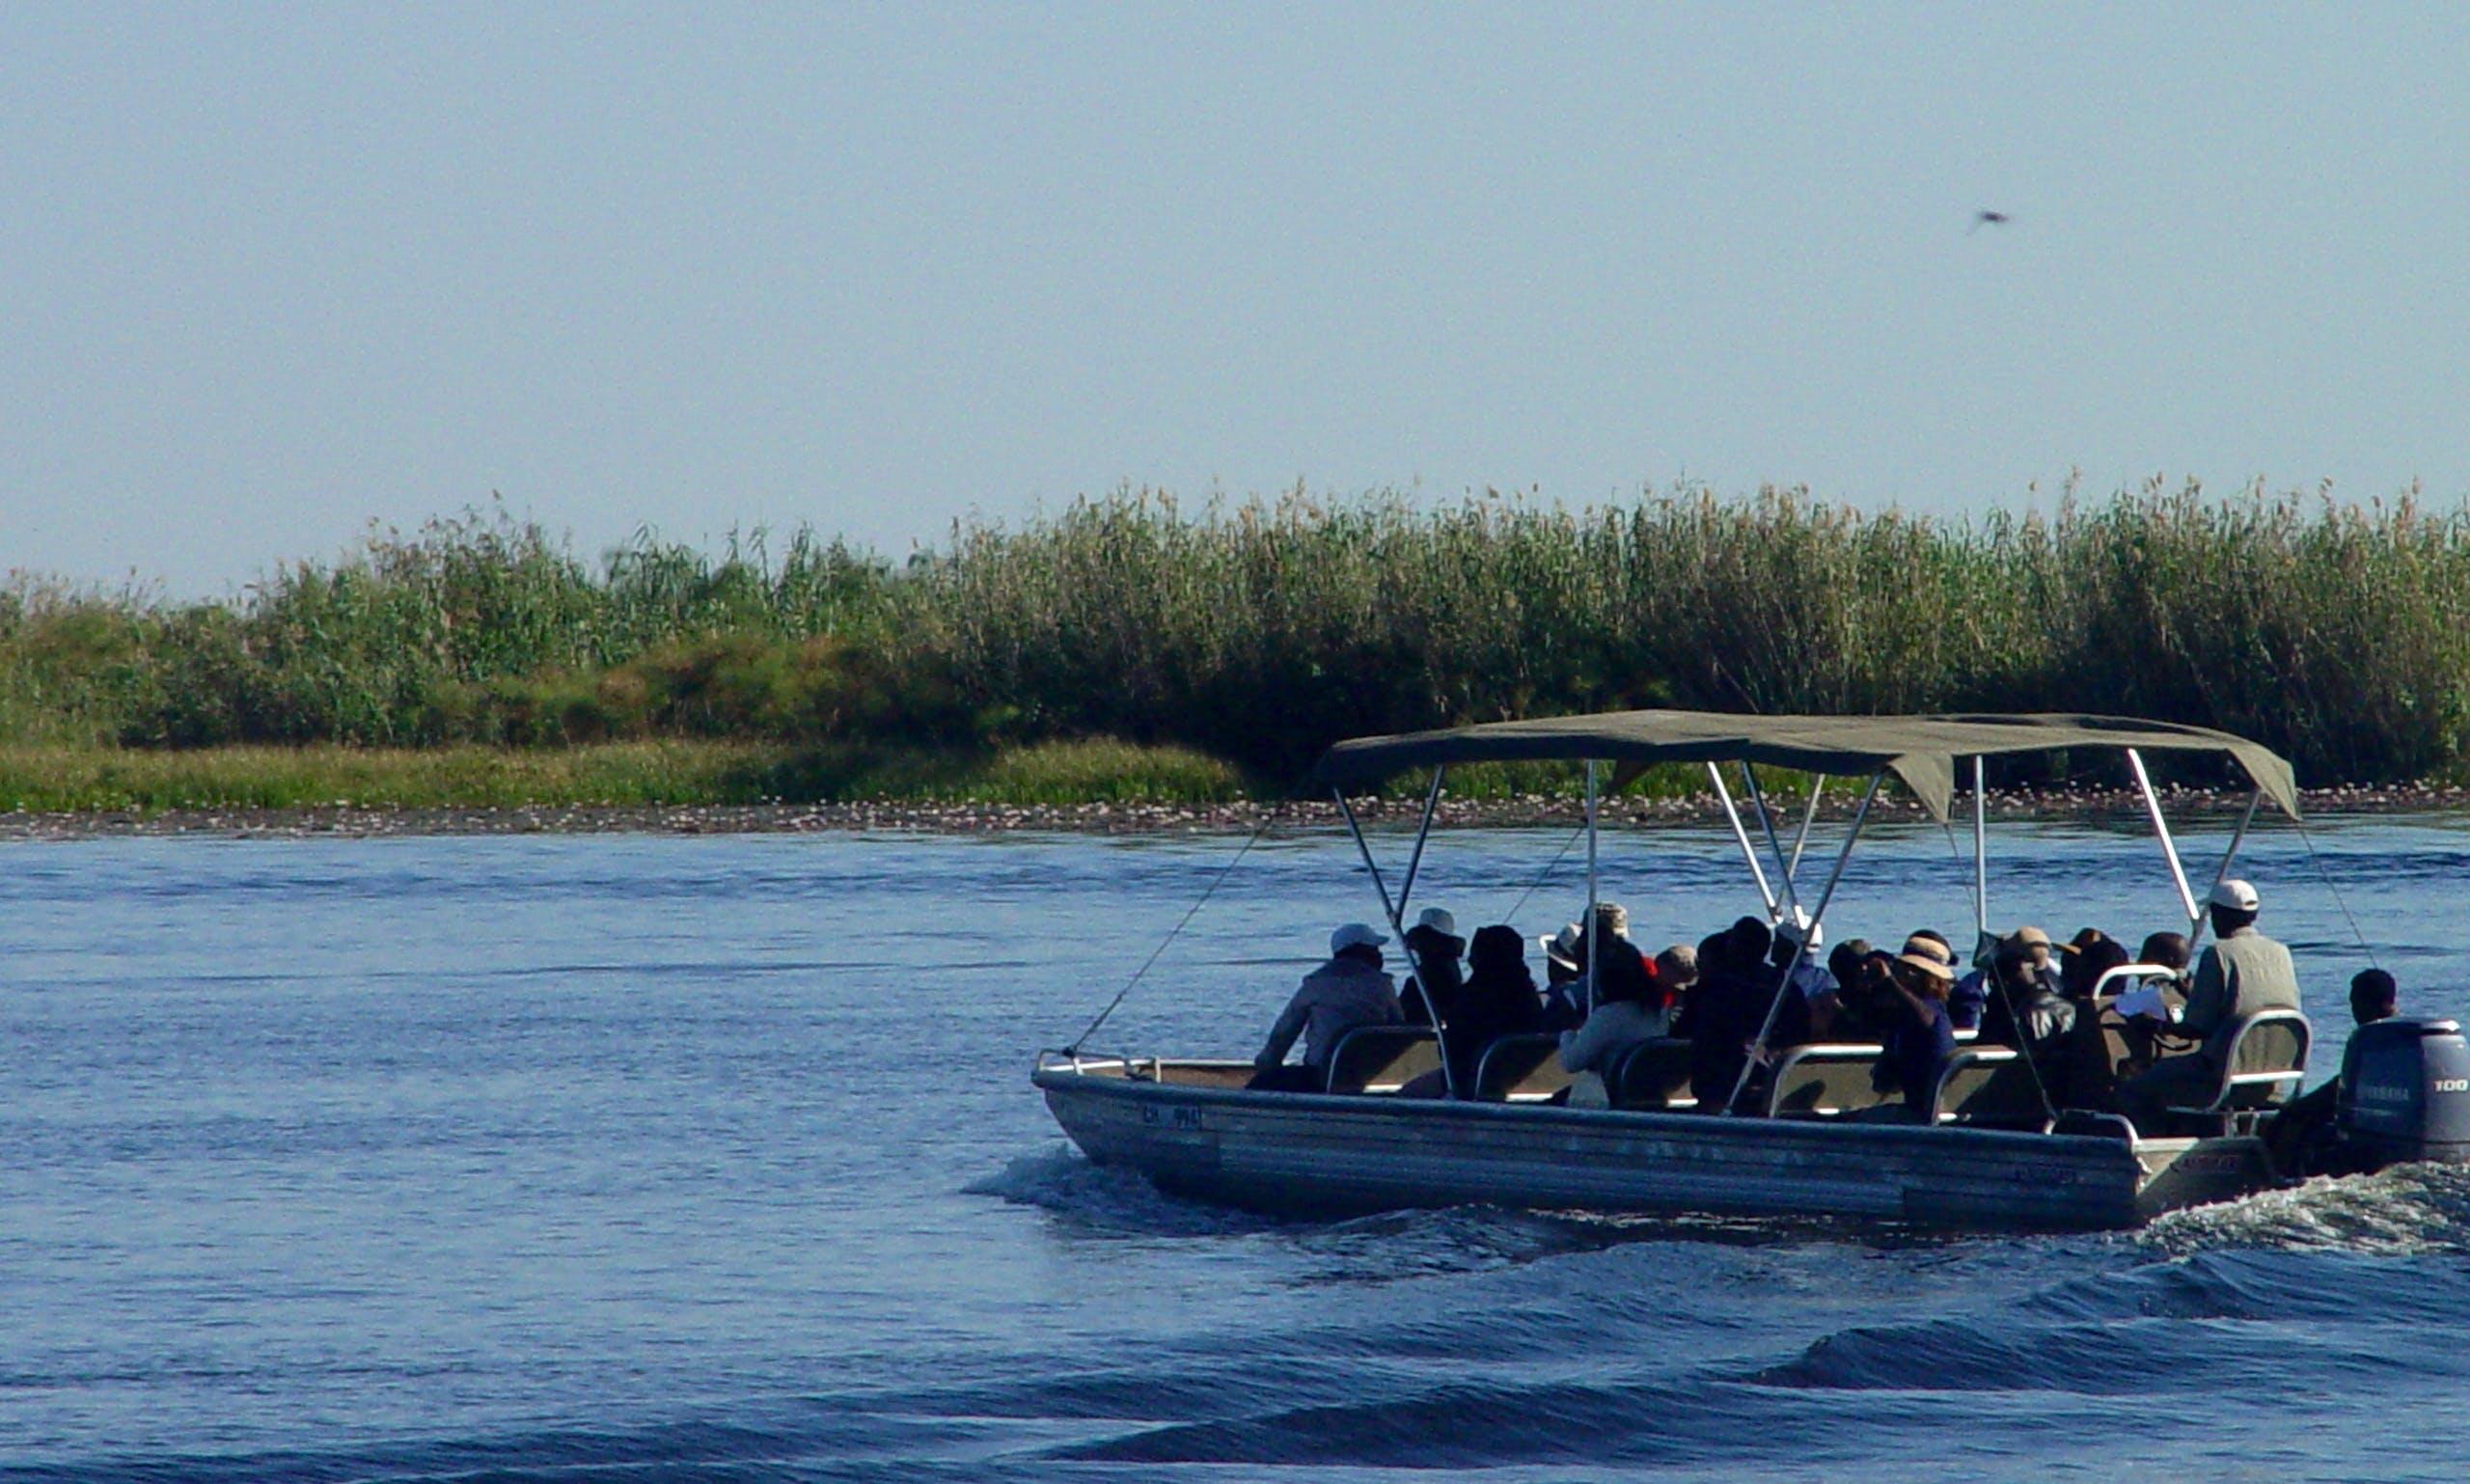 20 Seater Passenger Boat Trips in Kasane